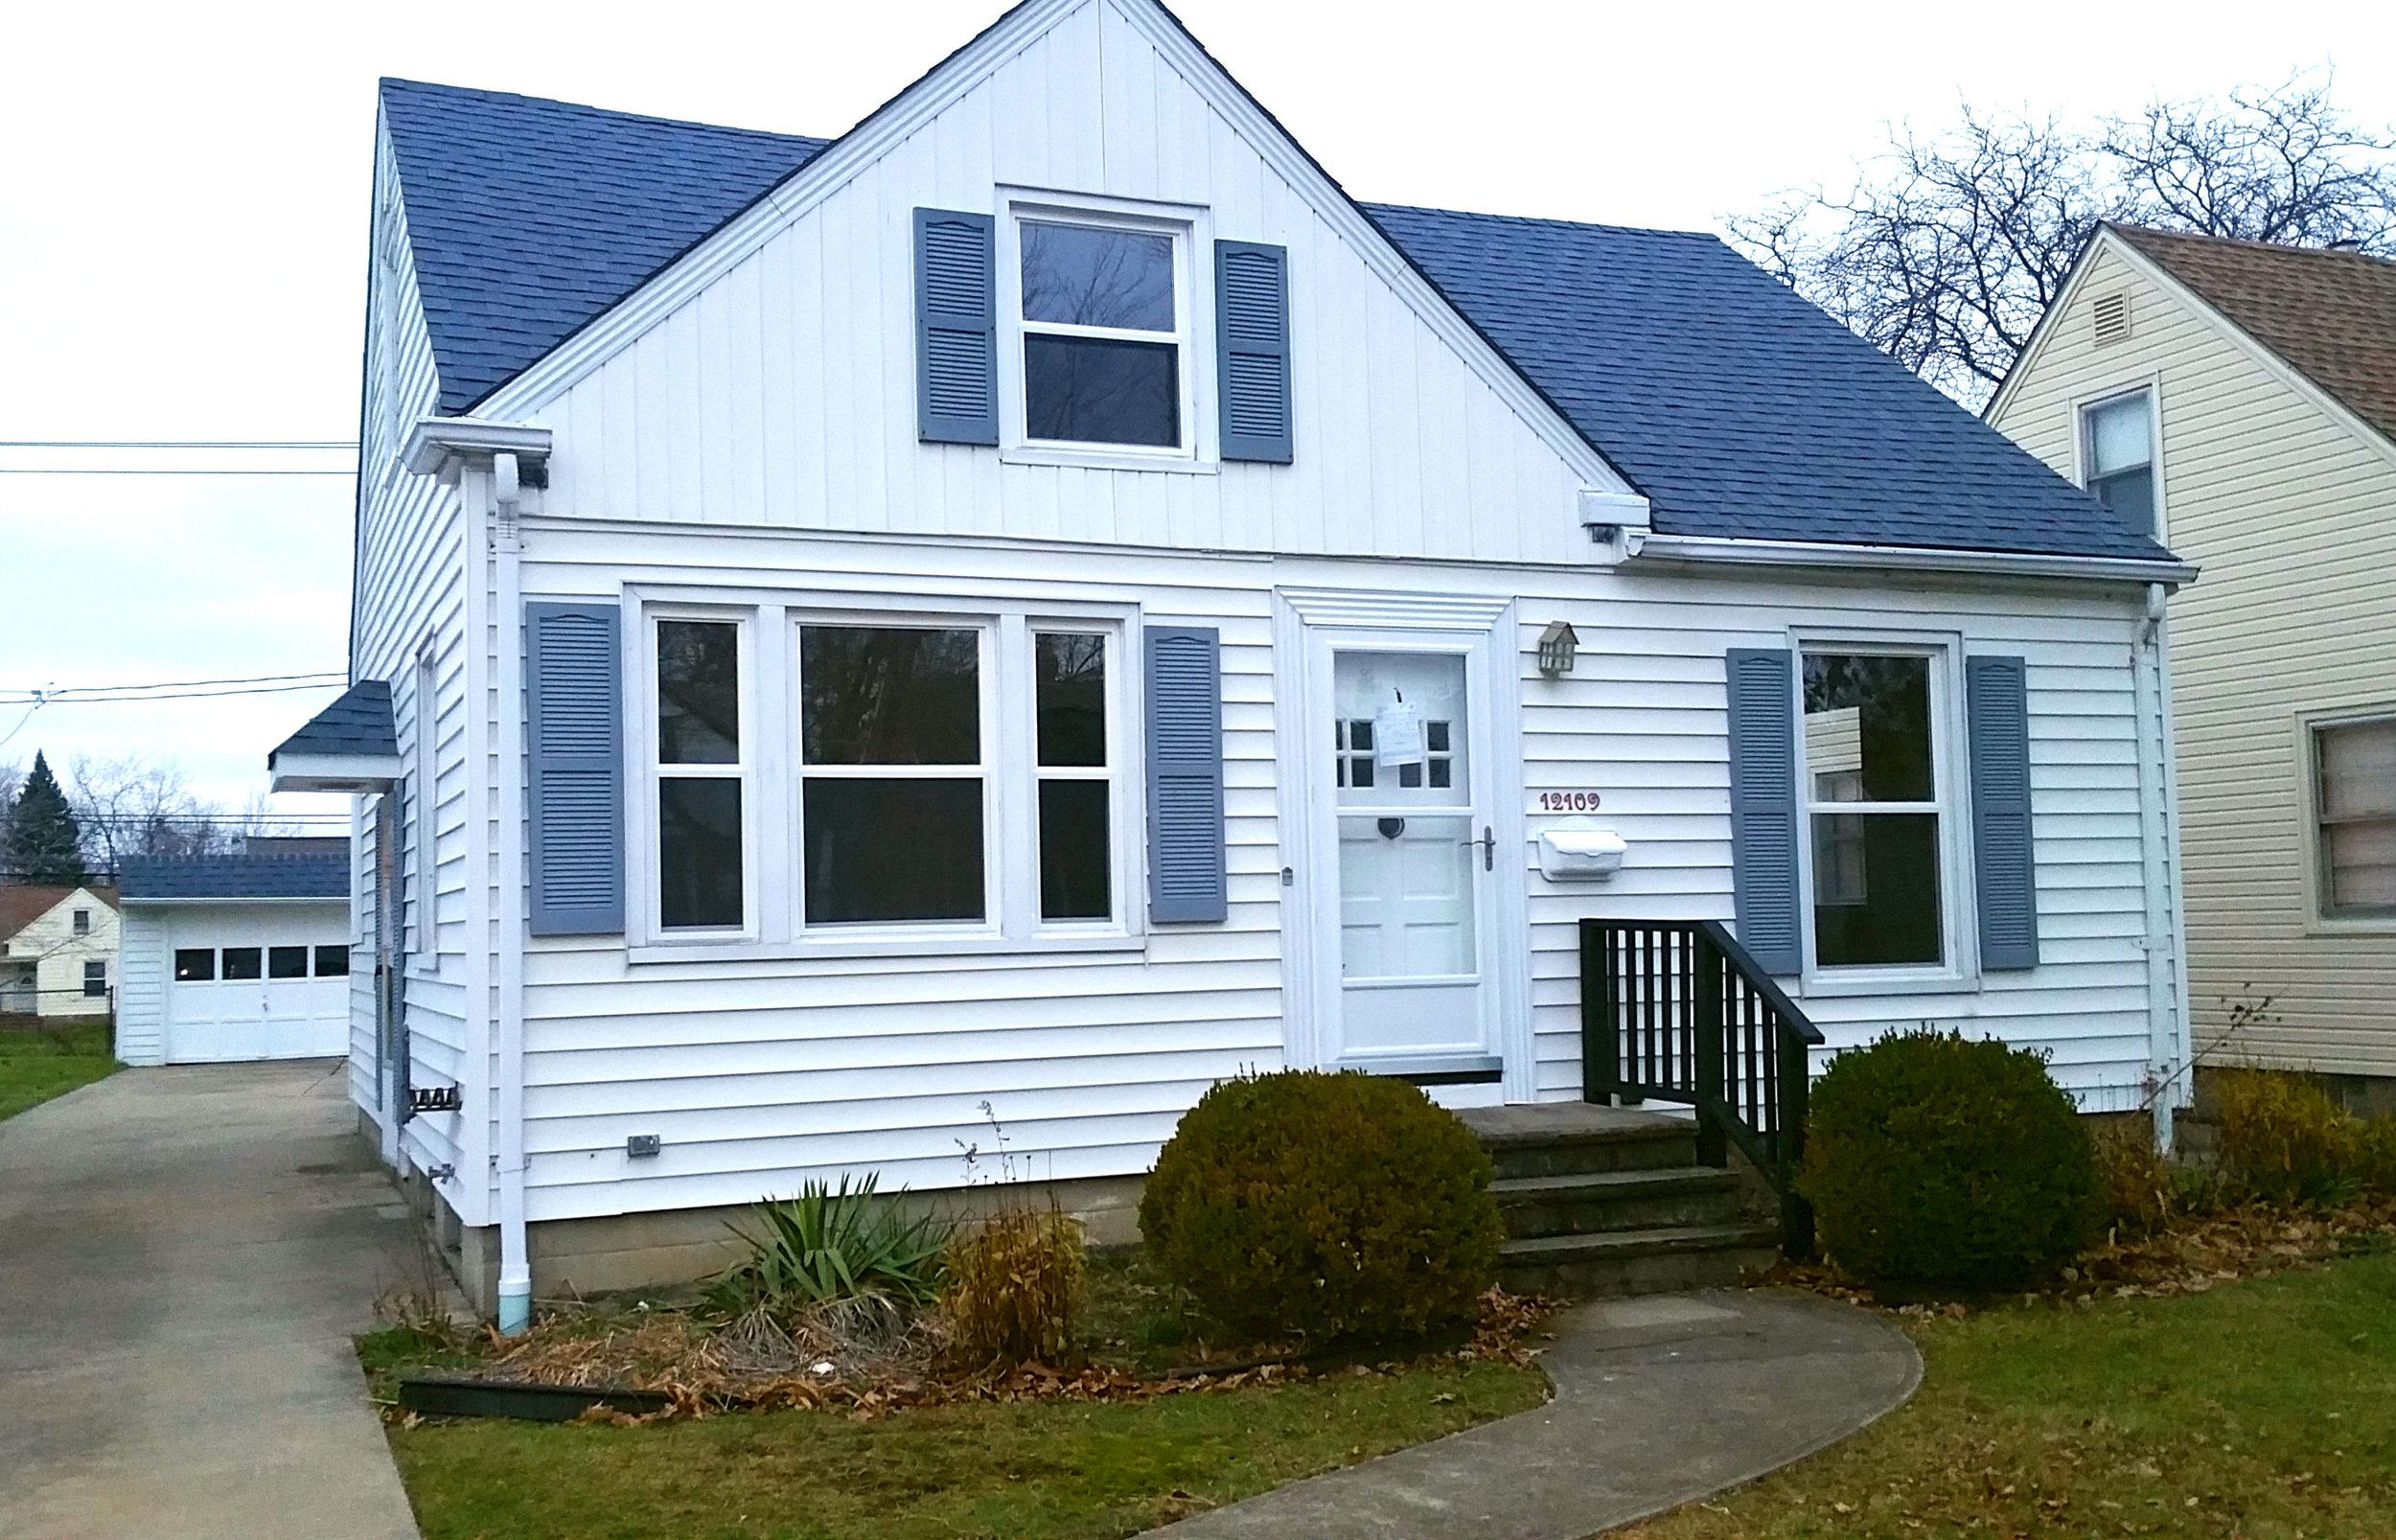 12109 Darlington Ave., Garfield Hts. | 4 bed 1 bath | 1,219 Sq. Ft. | $ 50,000